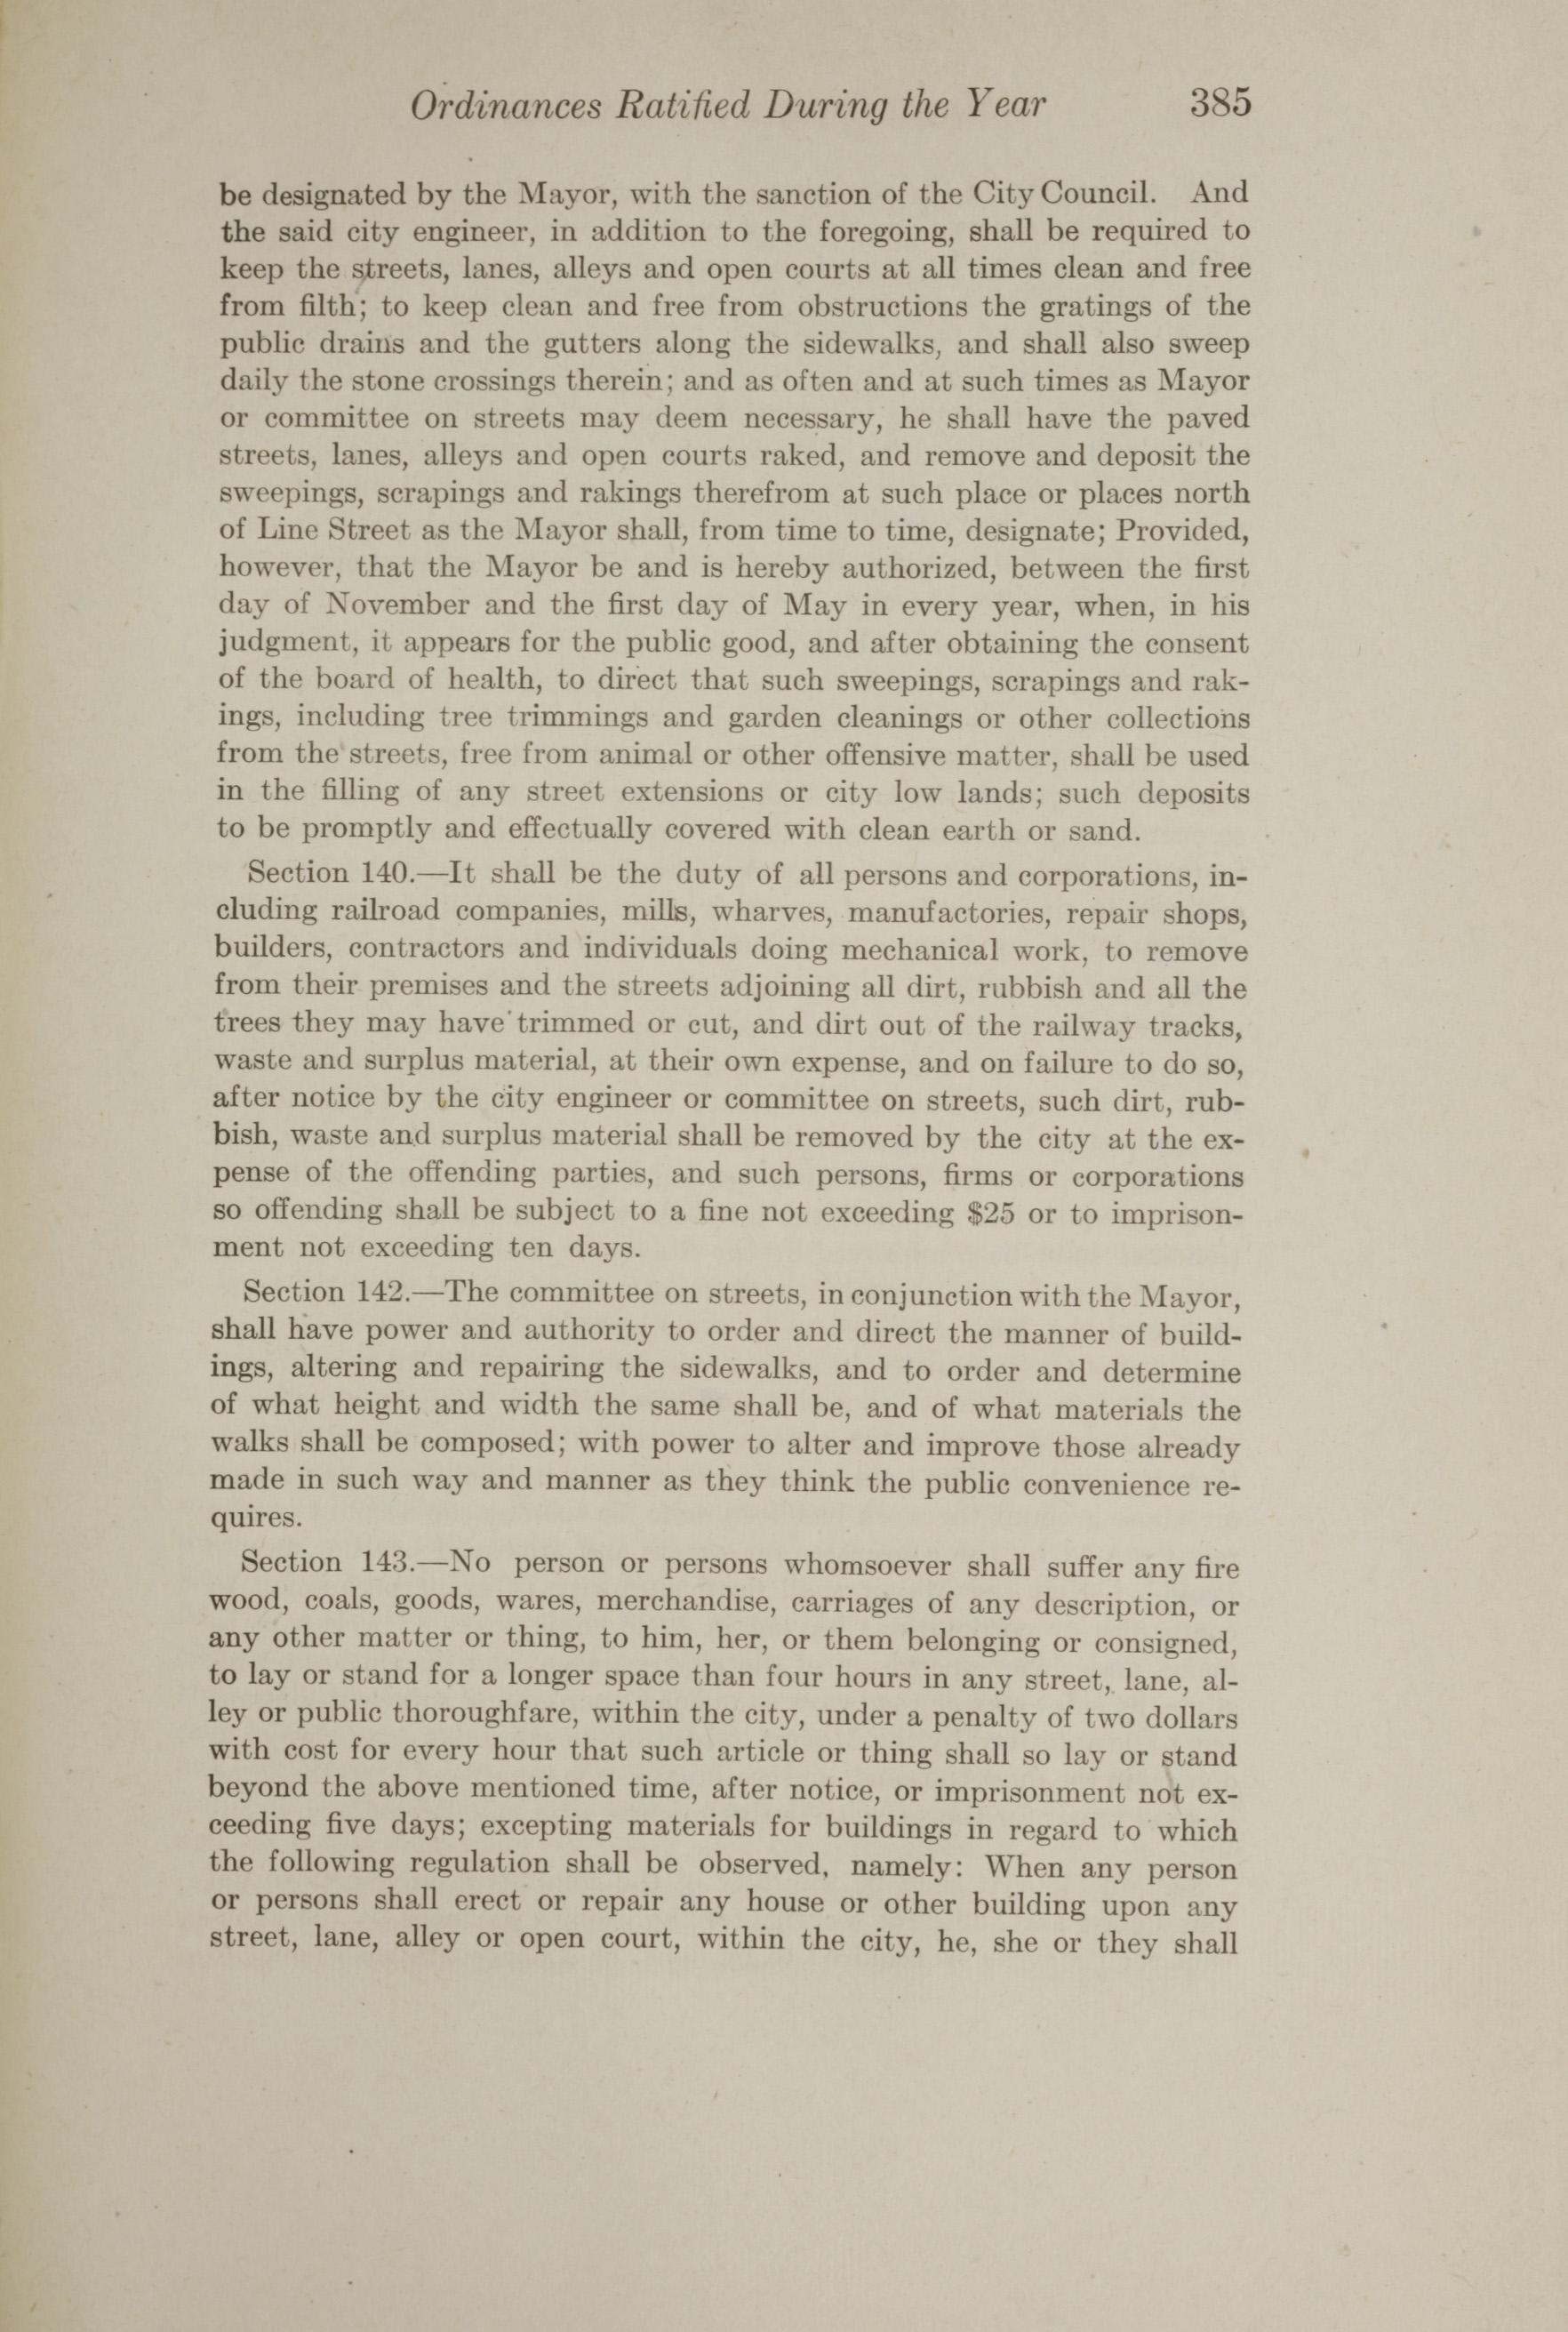 Charleston Yearbook, 1912, page 385